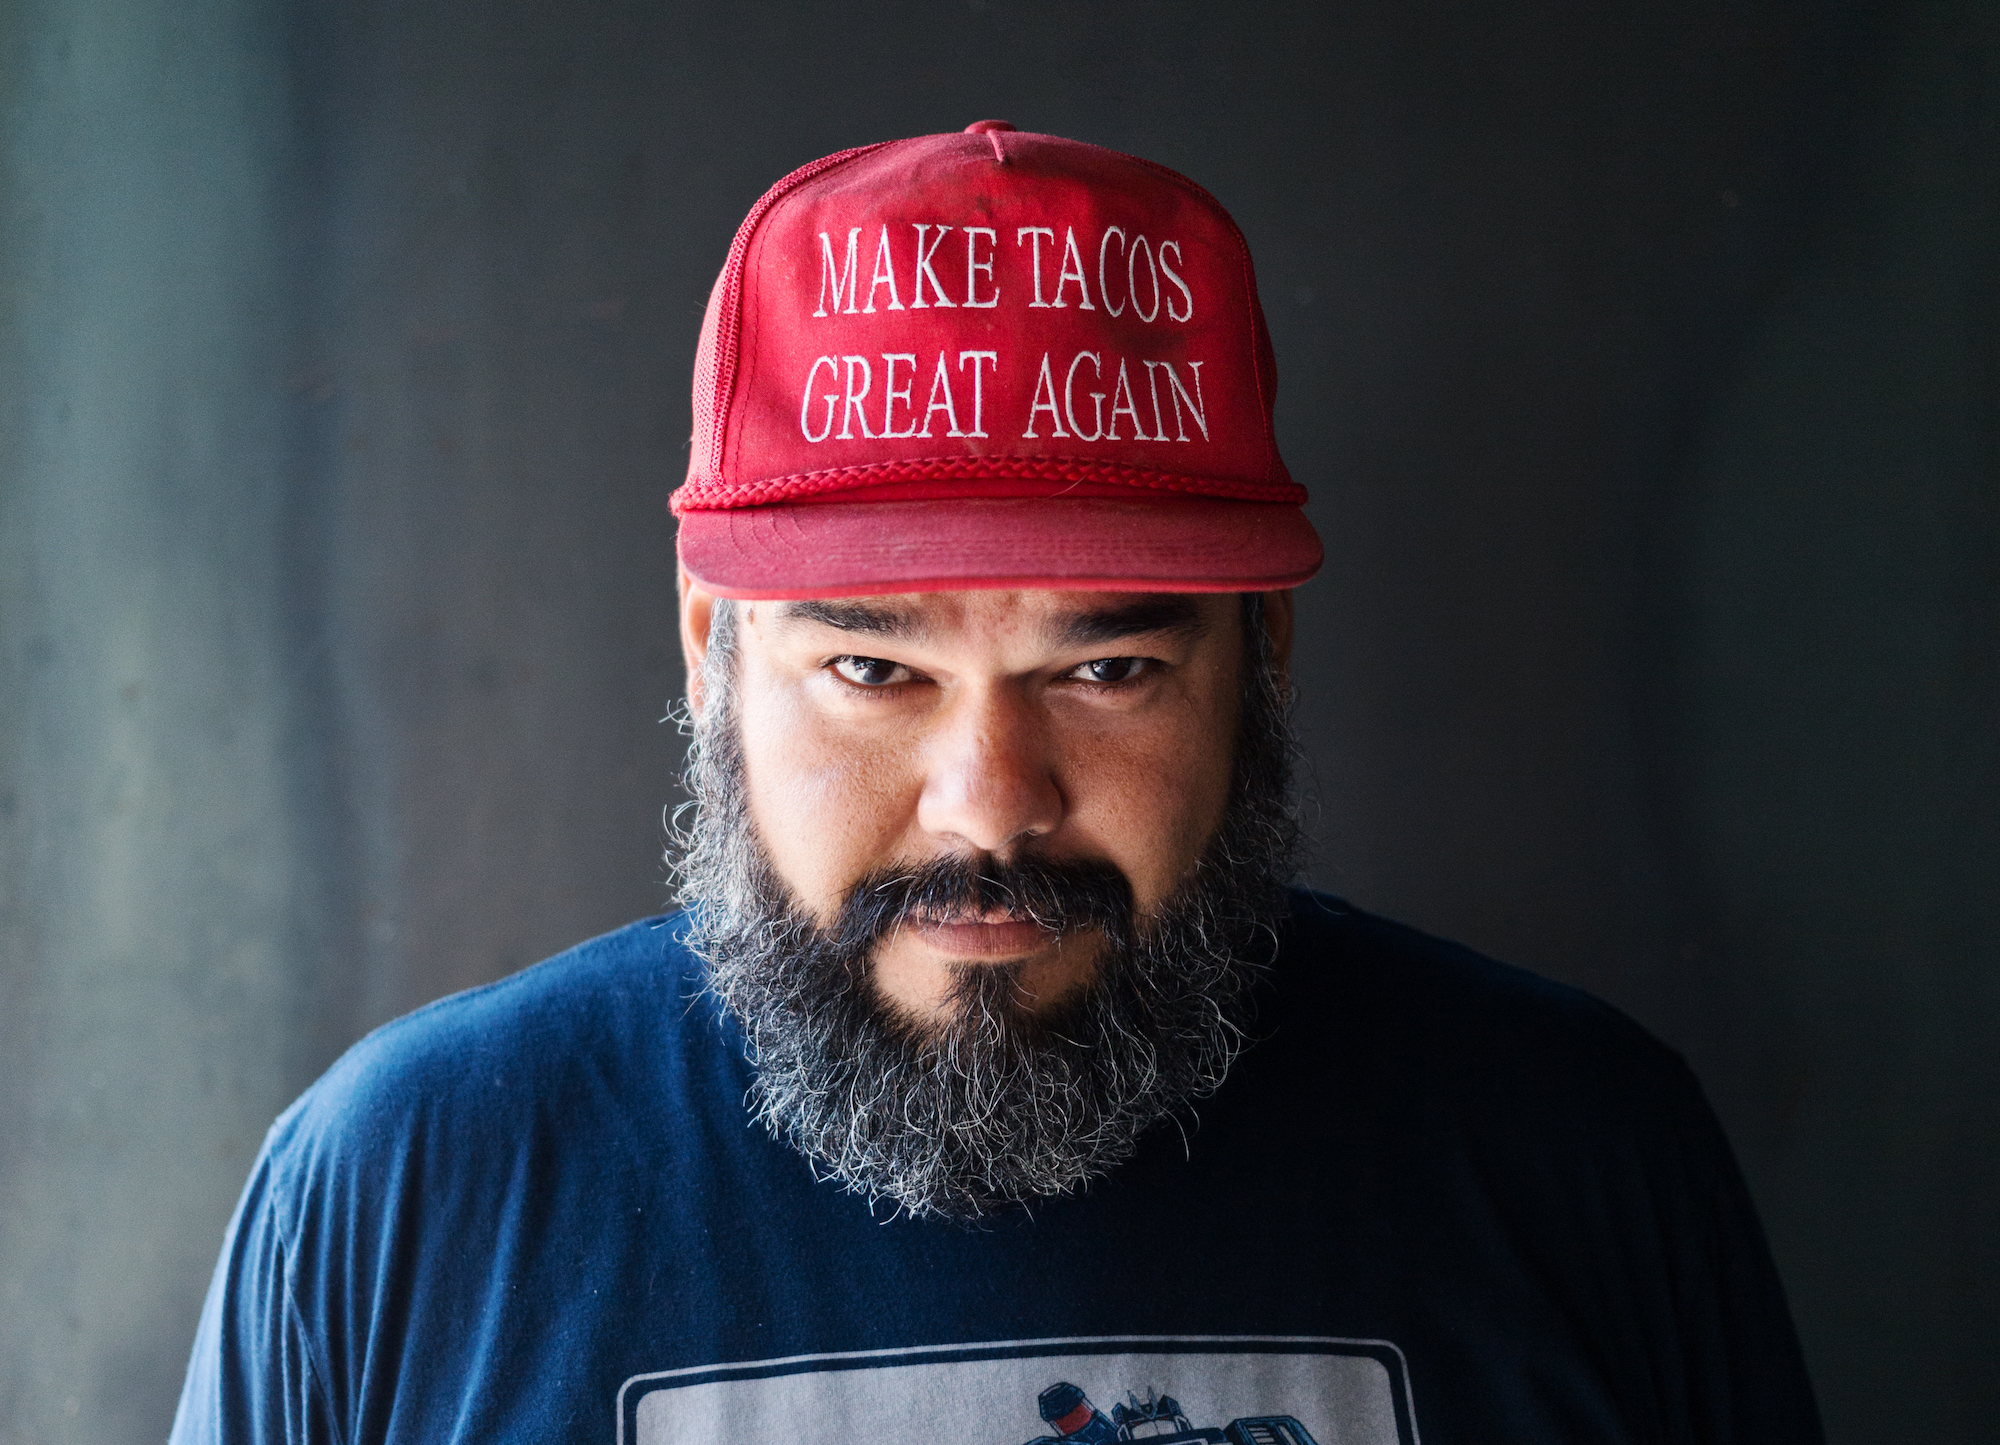 Chef Wes Avila in Los Angeles, California